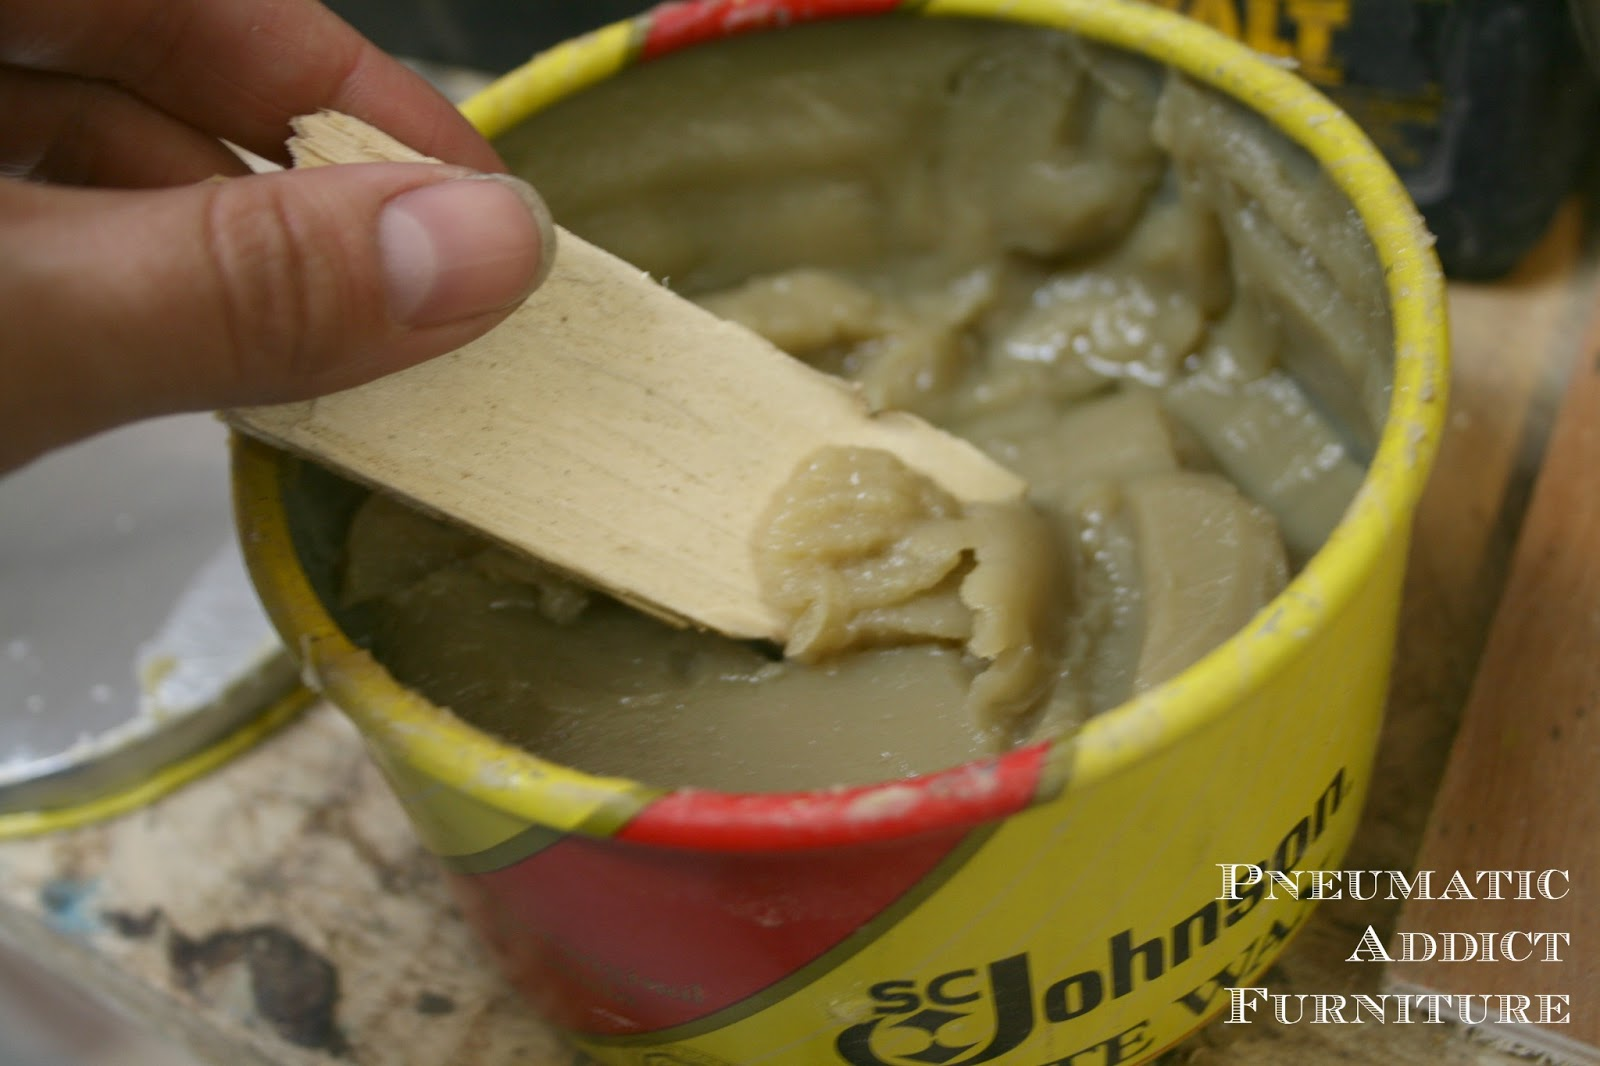 Johnsons Wax